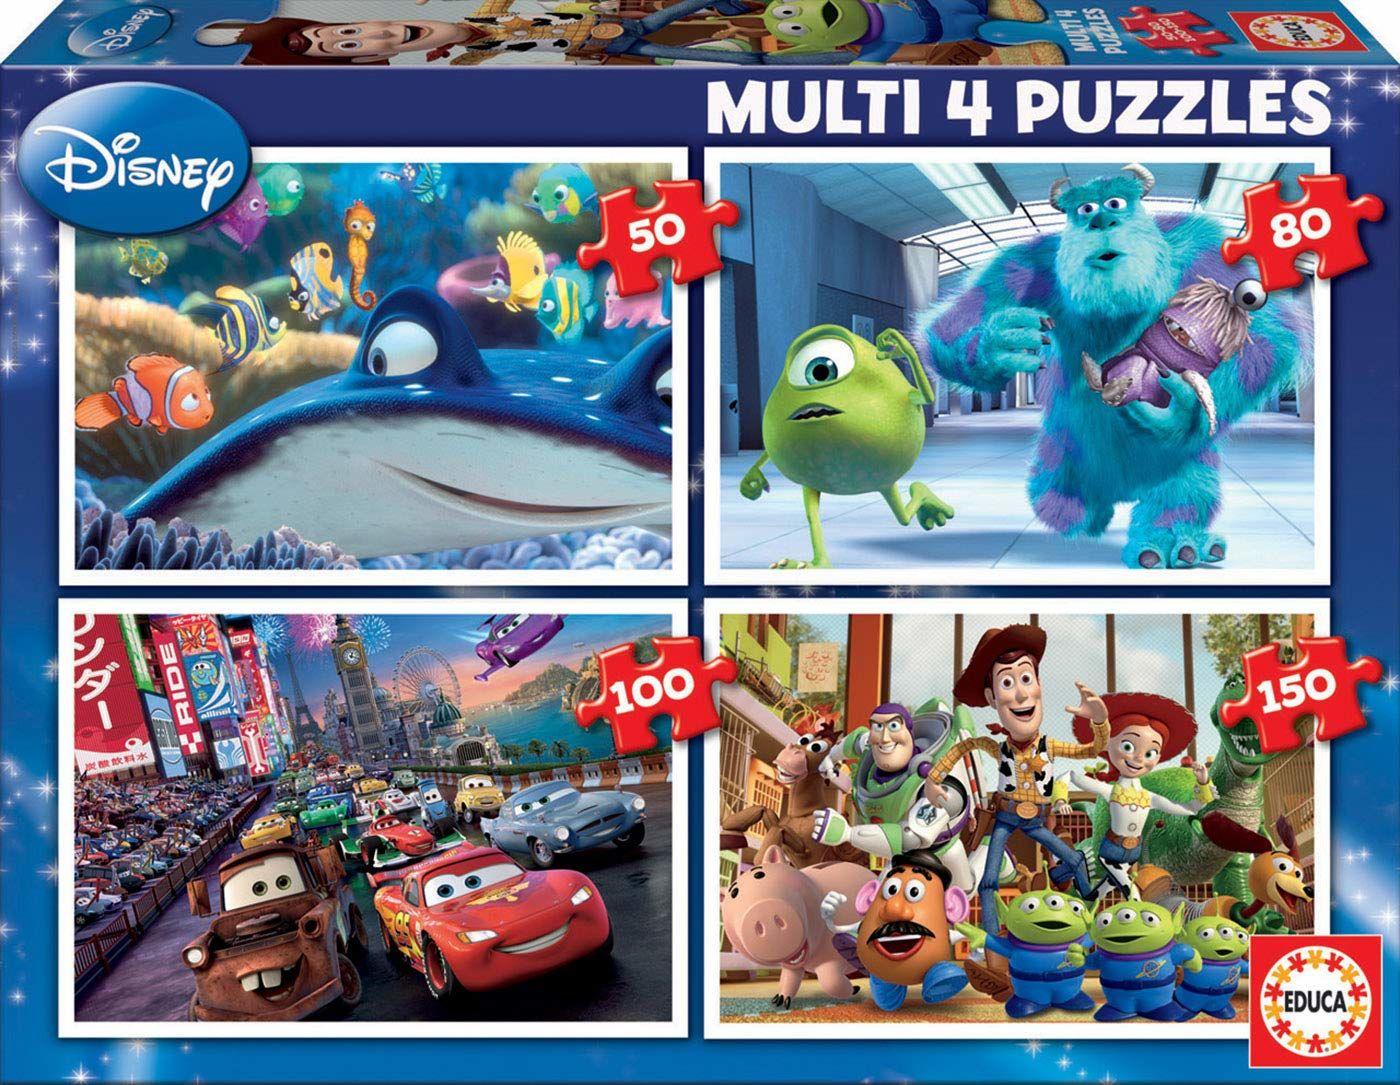 Educa Borras Multi Puzzle 4 w 1 Pixar Nemo Monsters Samochody Toy Story